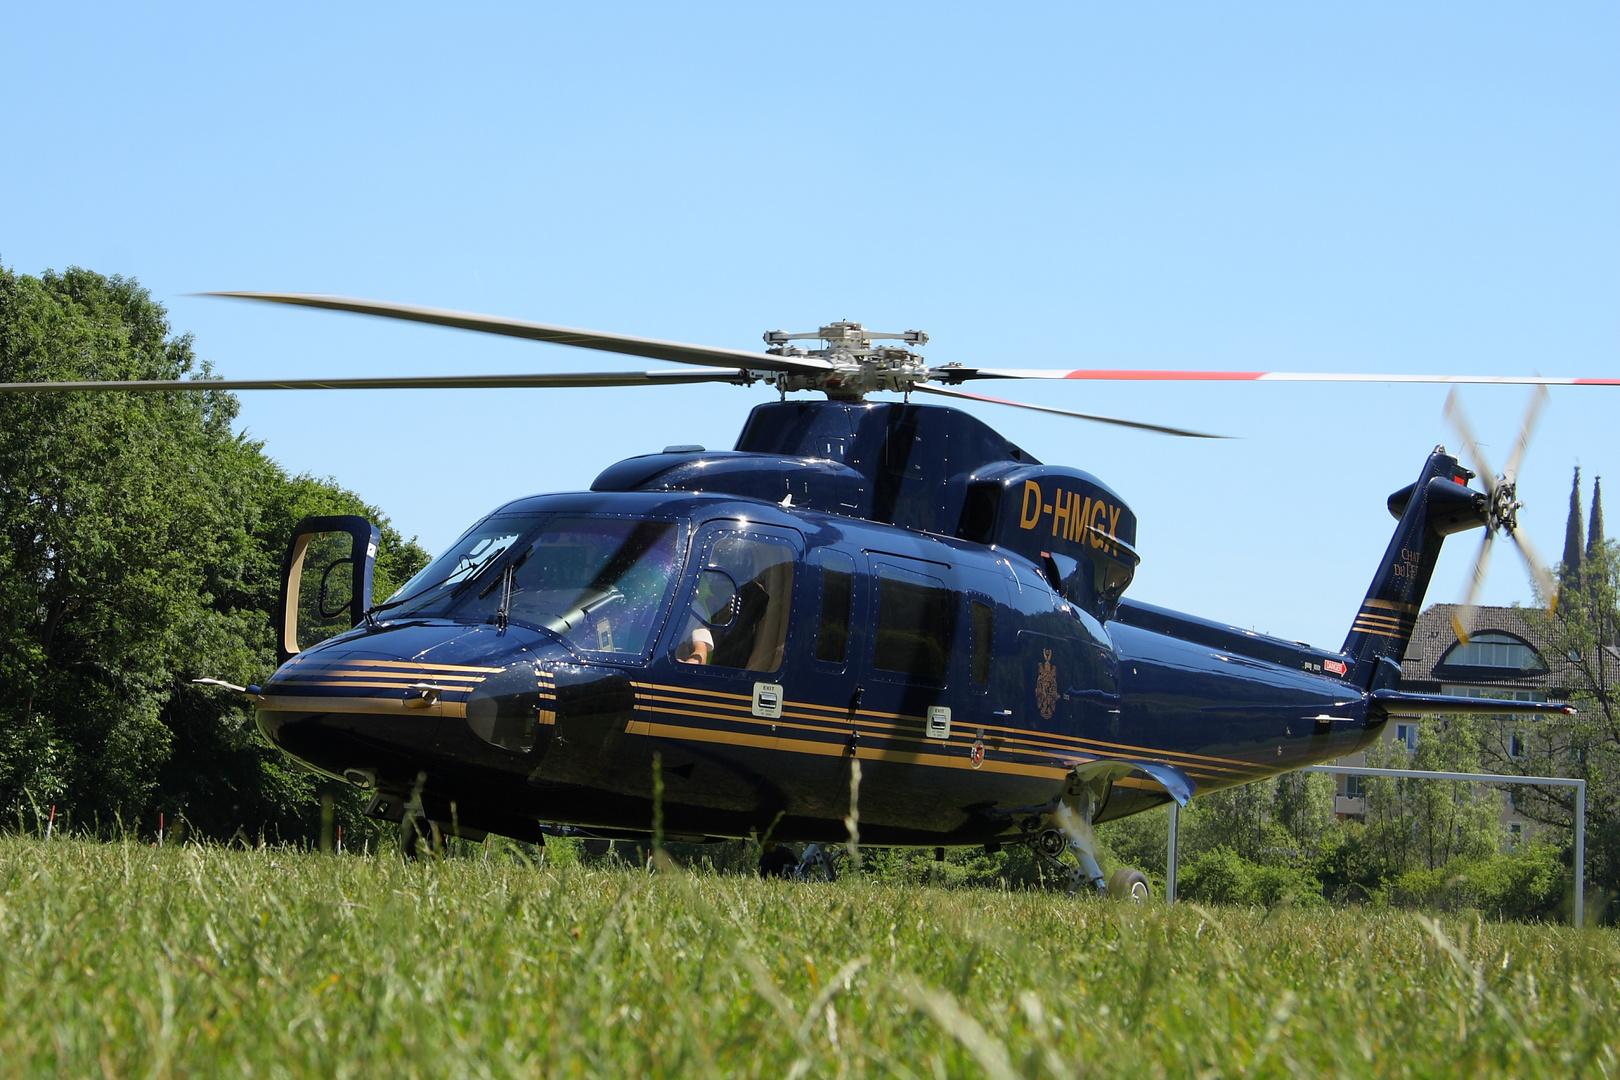 Sikorsky S-76 C++